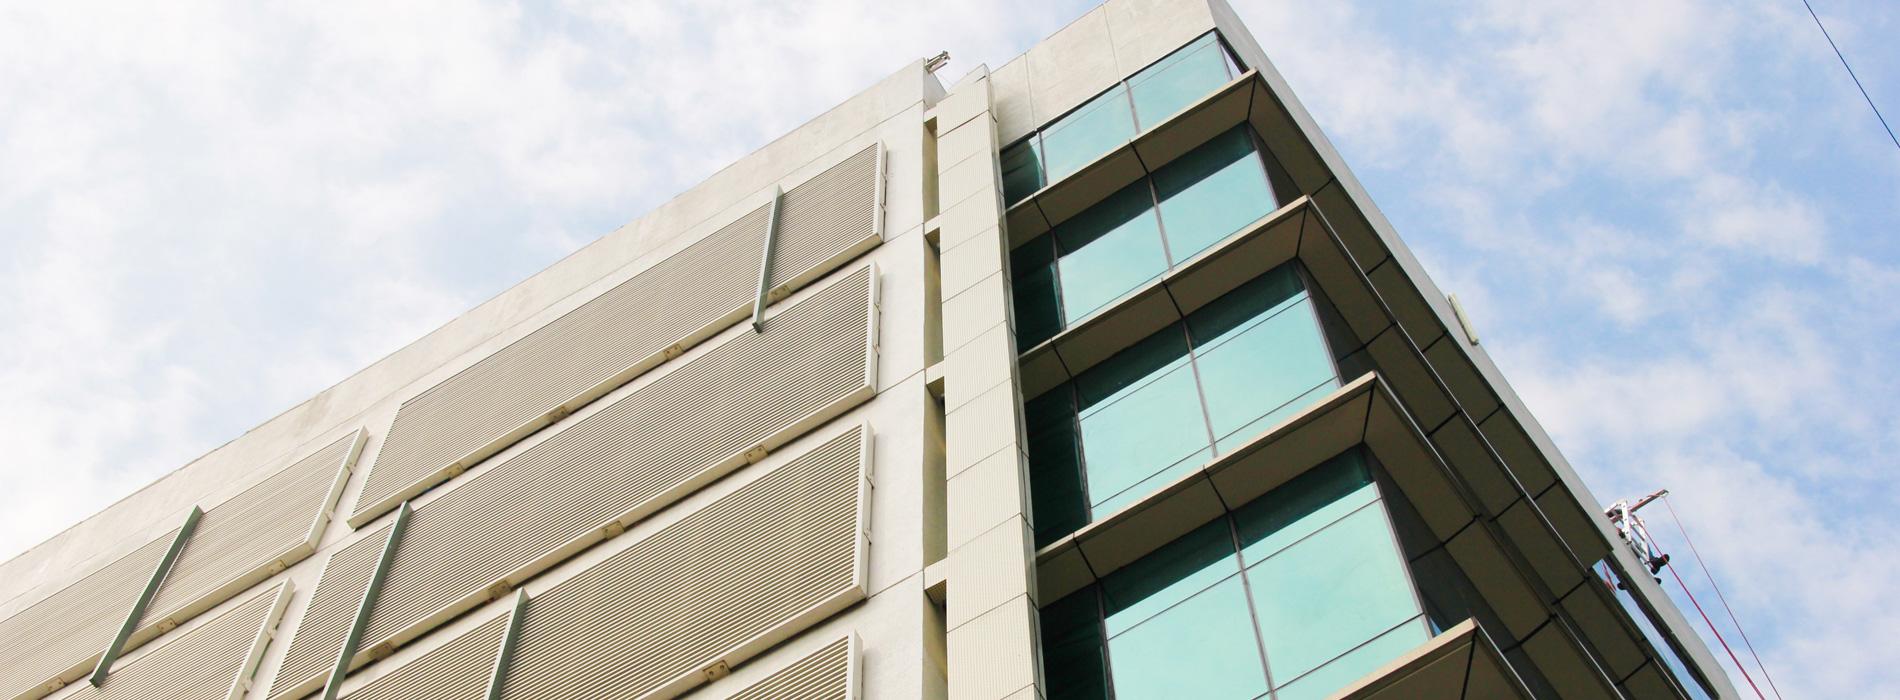 Silver Finance Building